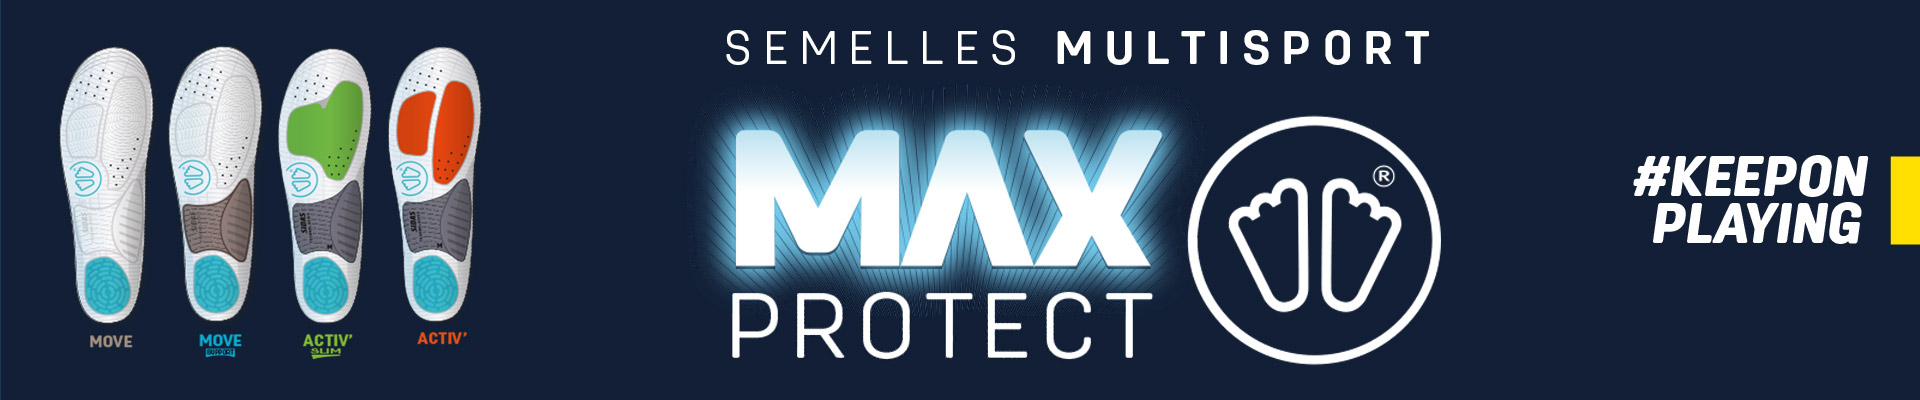 Semelles Multi-sports anti-chocs Max Protect